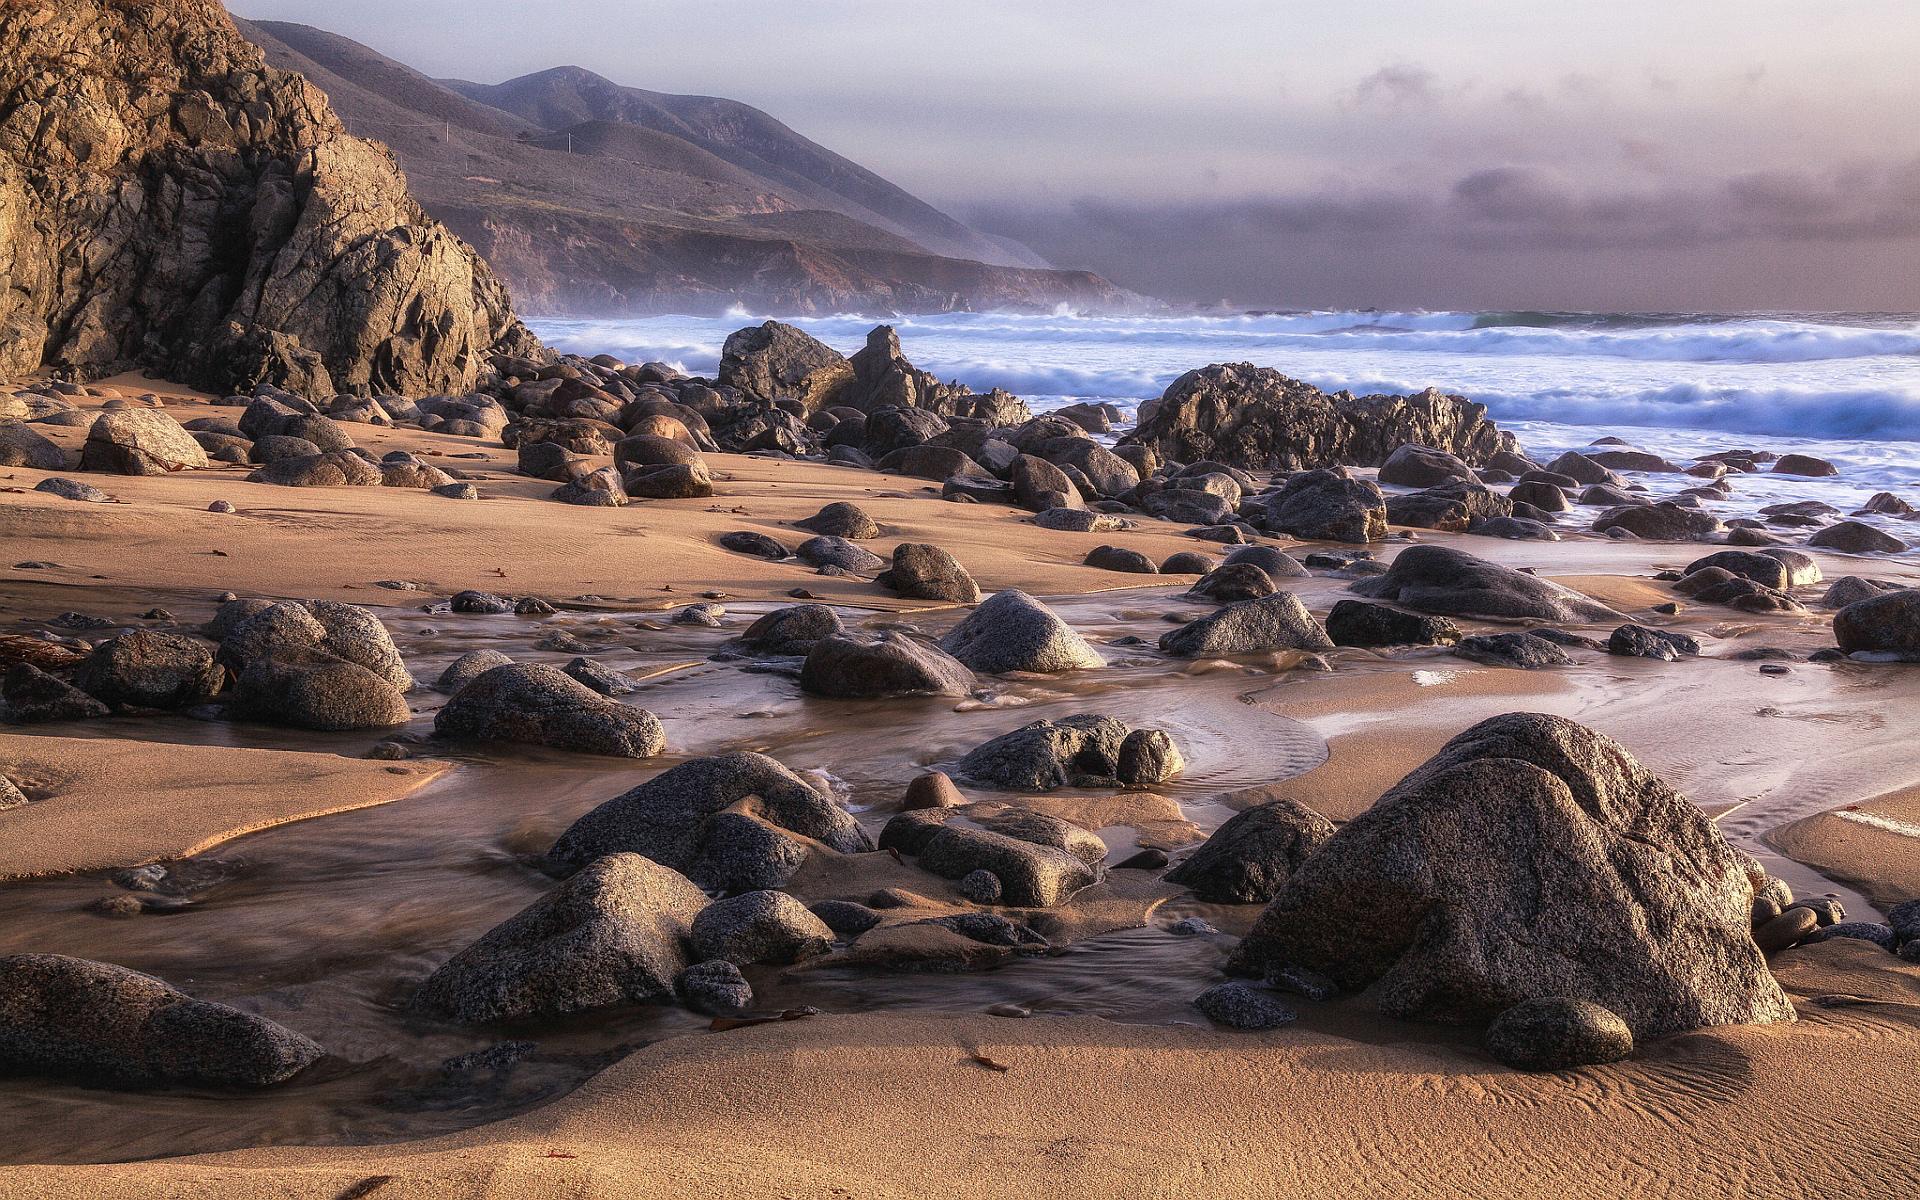 Rhode island shore rocks